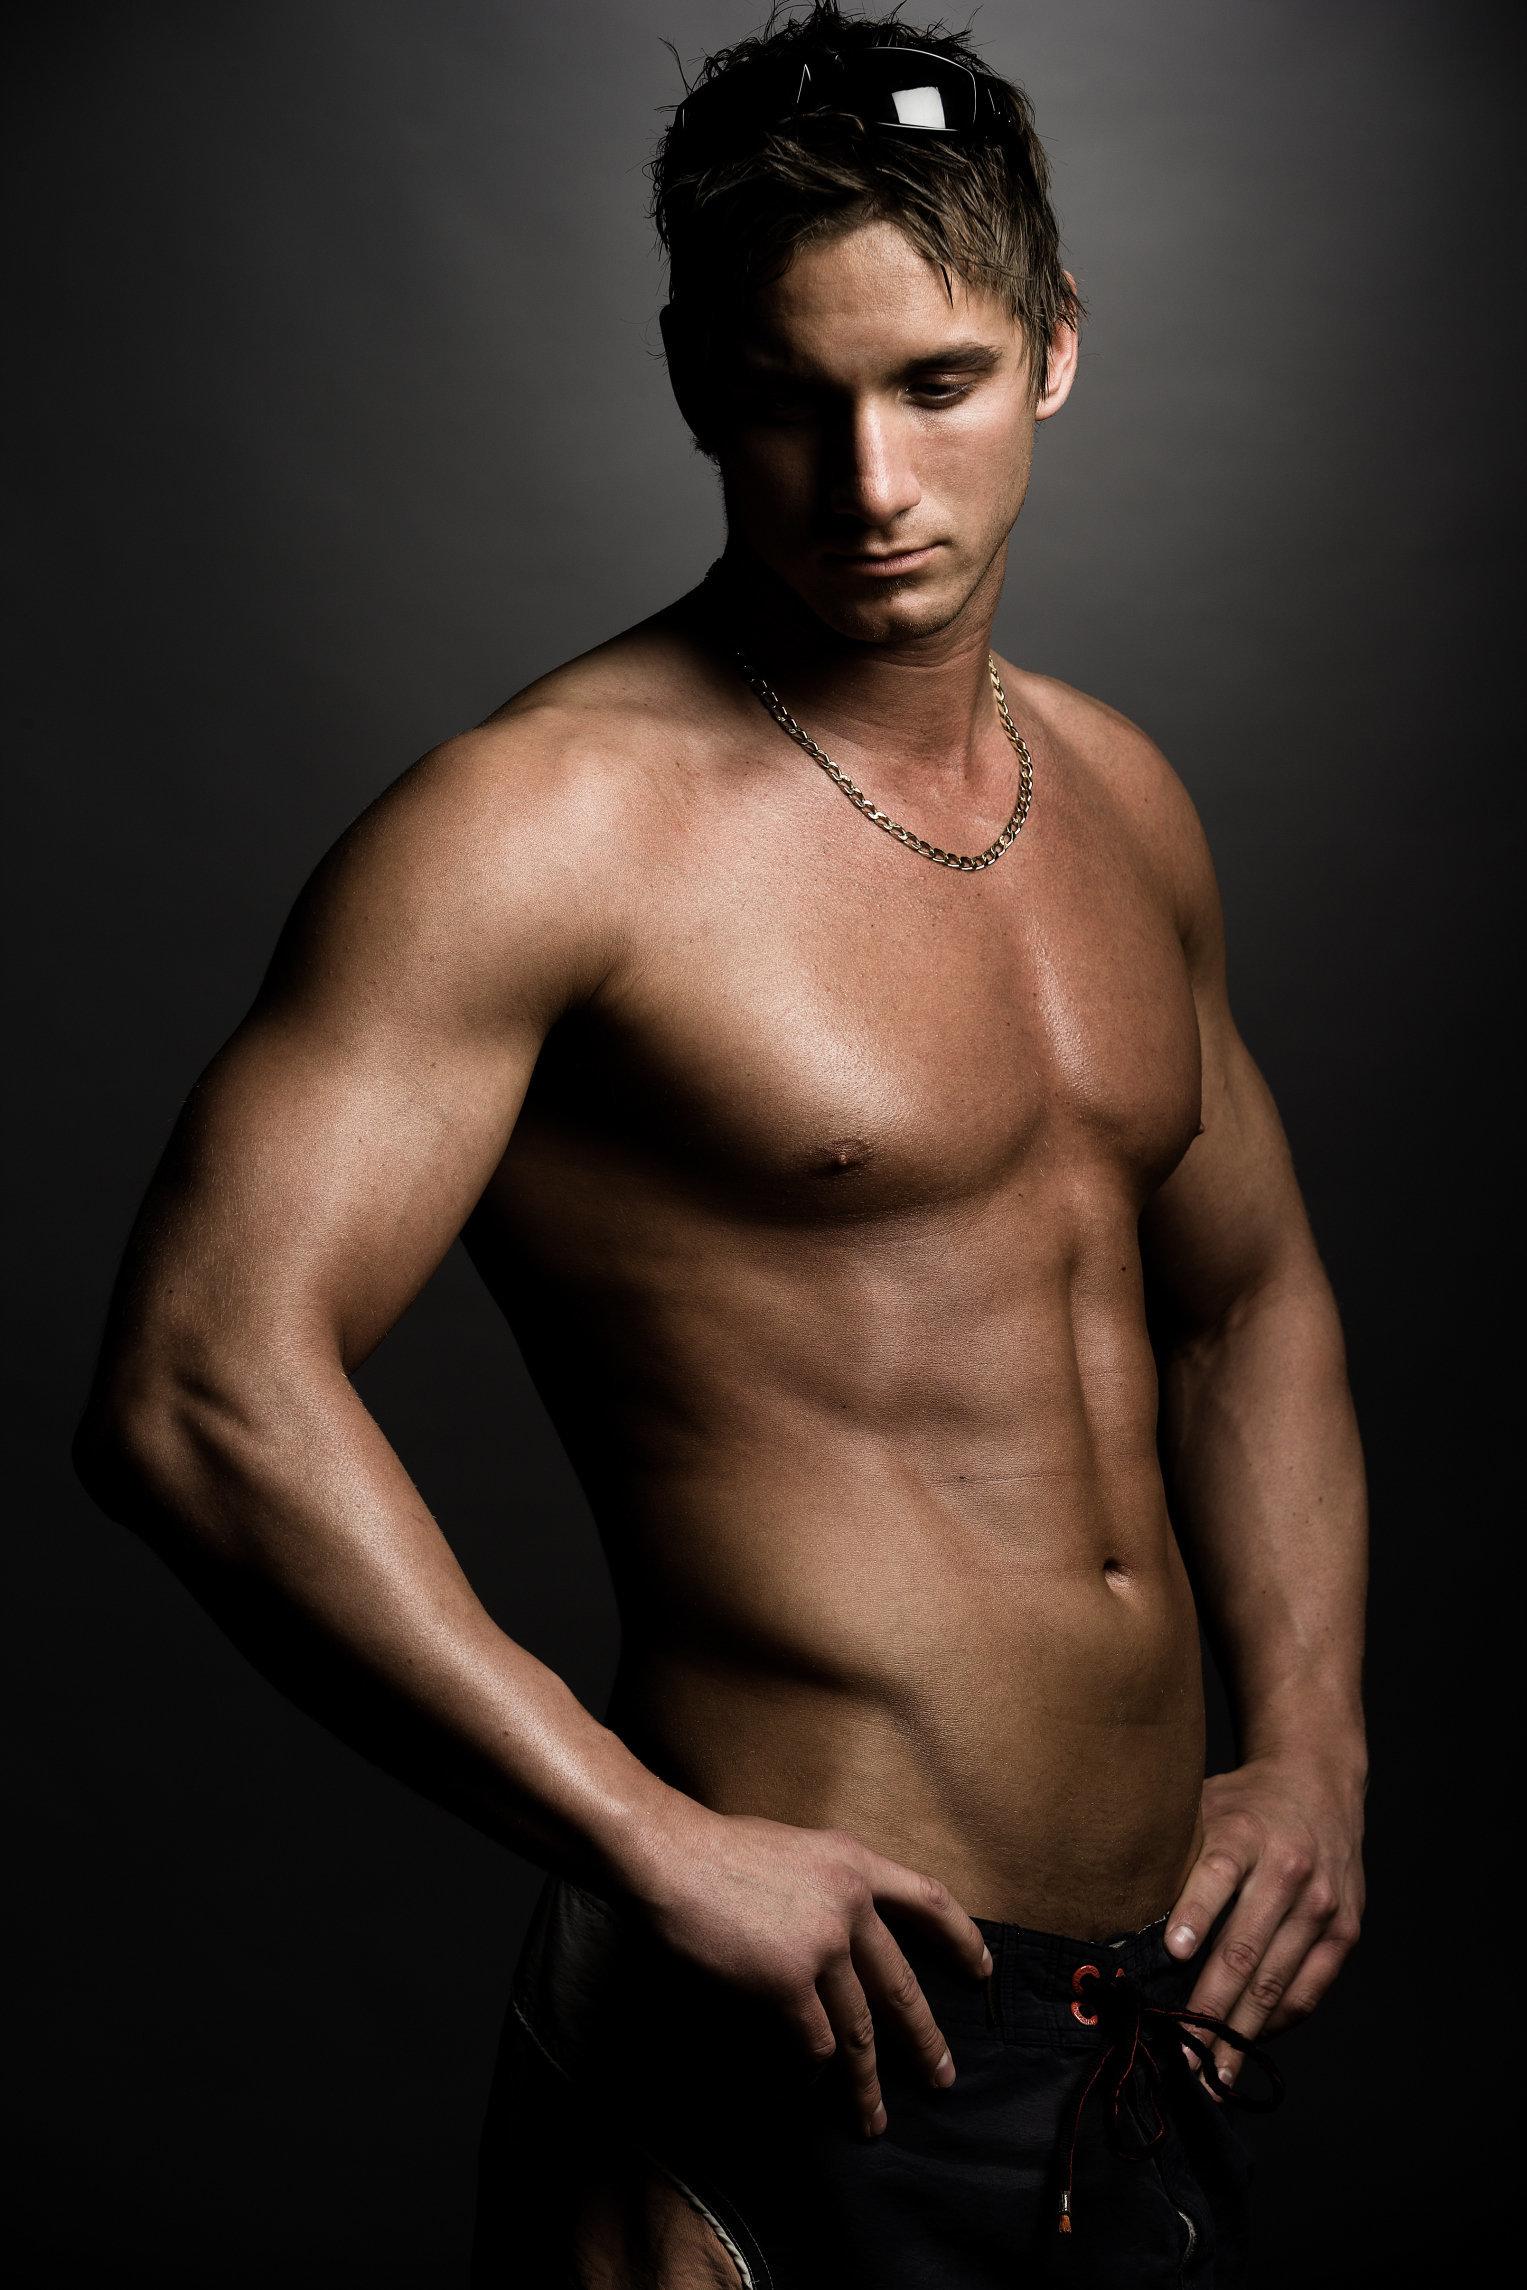 Desi nude straight boys pic